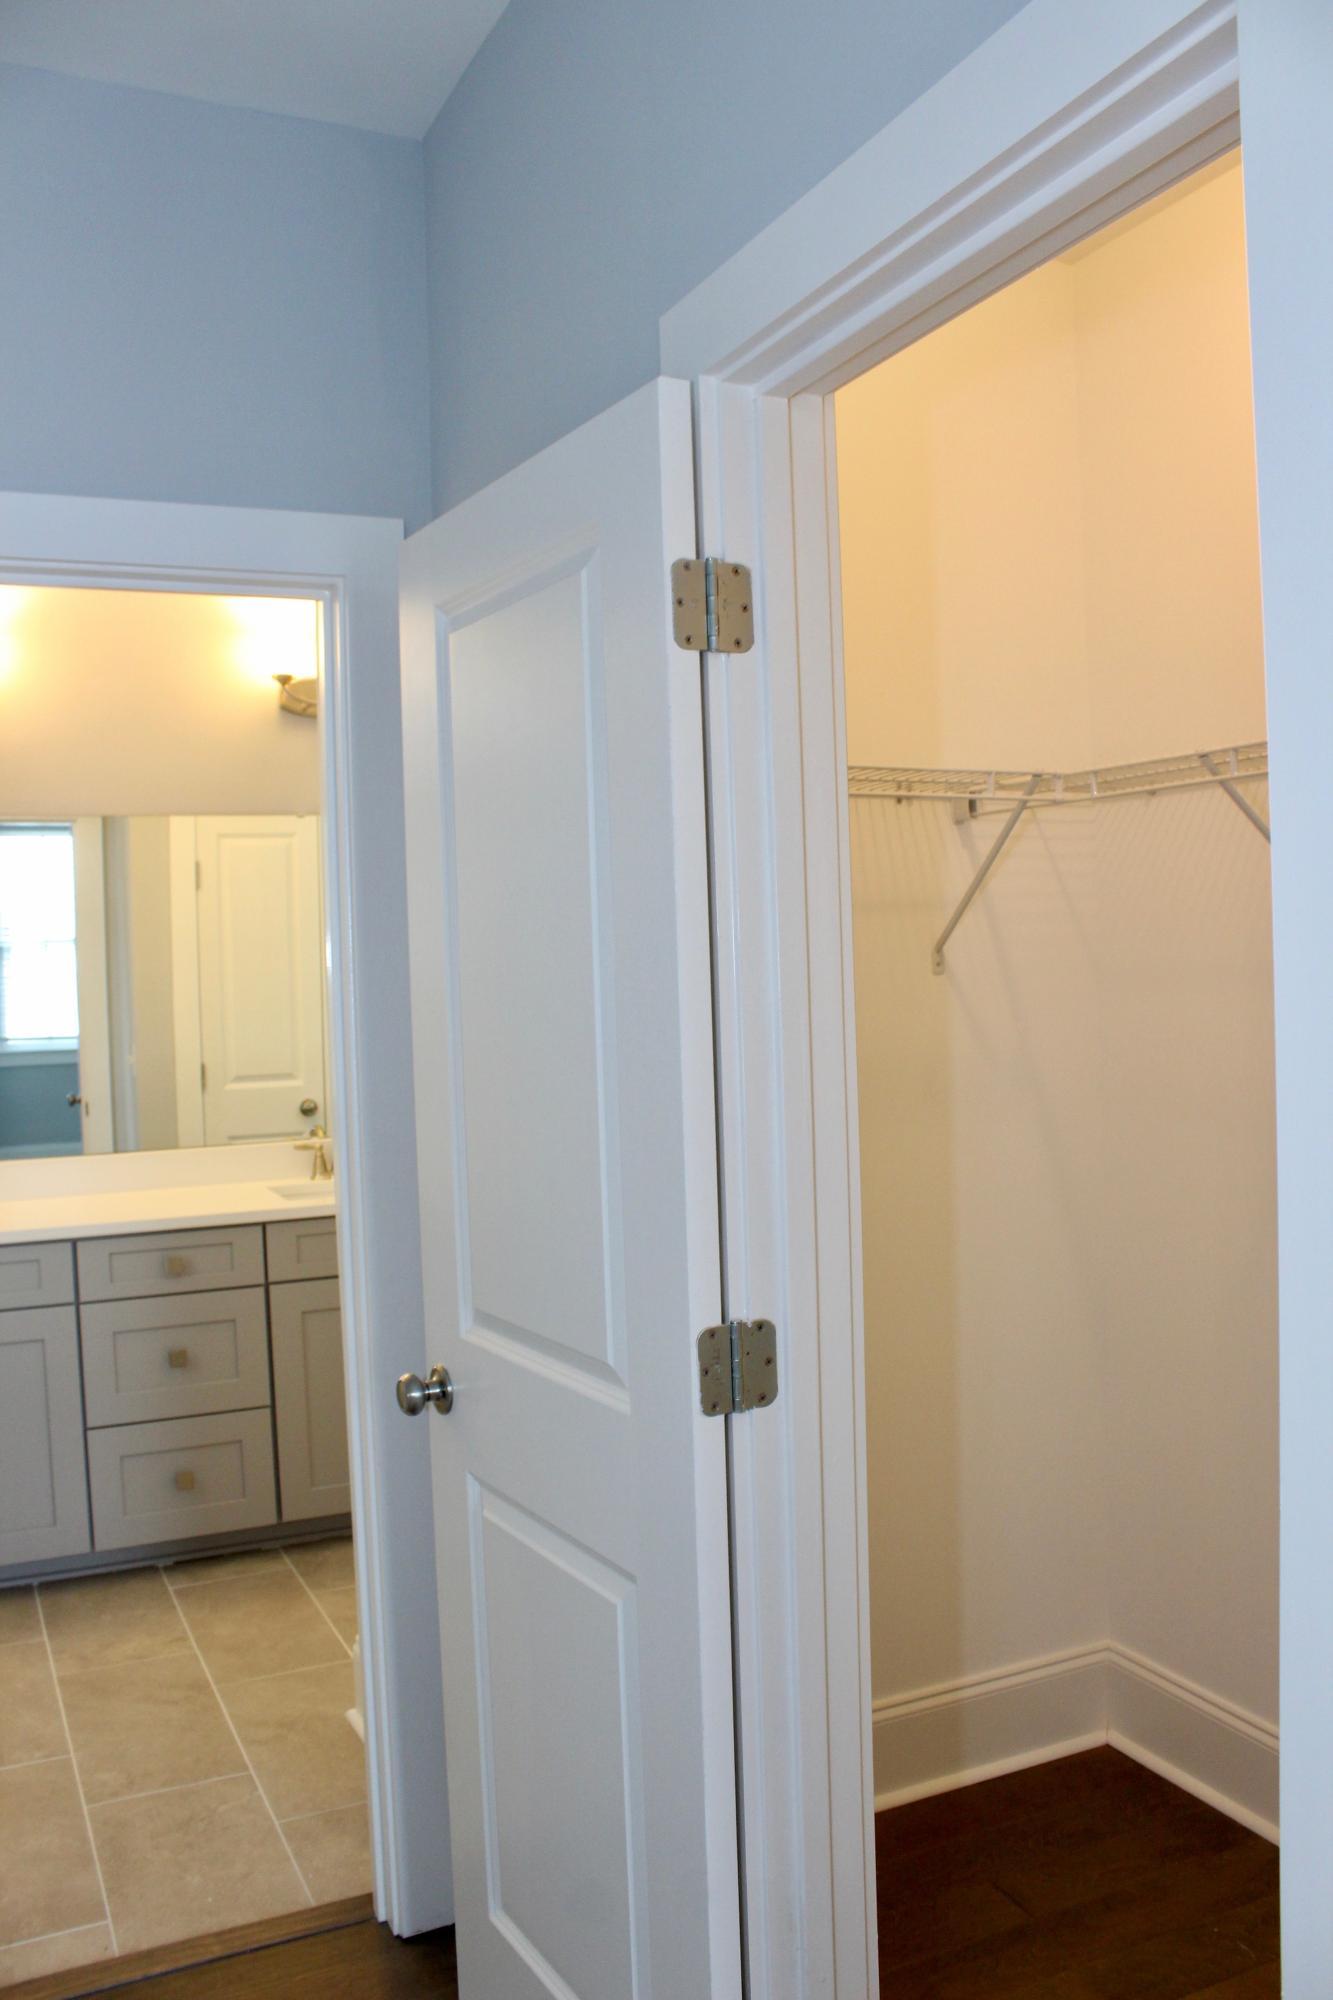 Morris Square Homes For Sale - 41 Dereef, Charleston, SC - 35